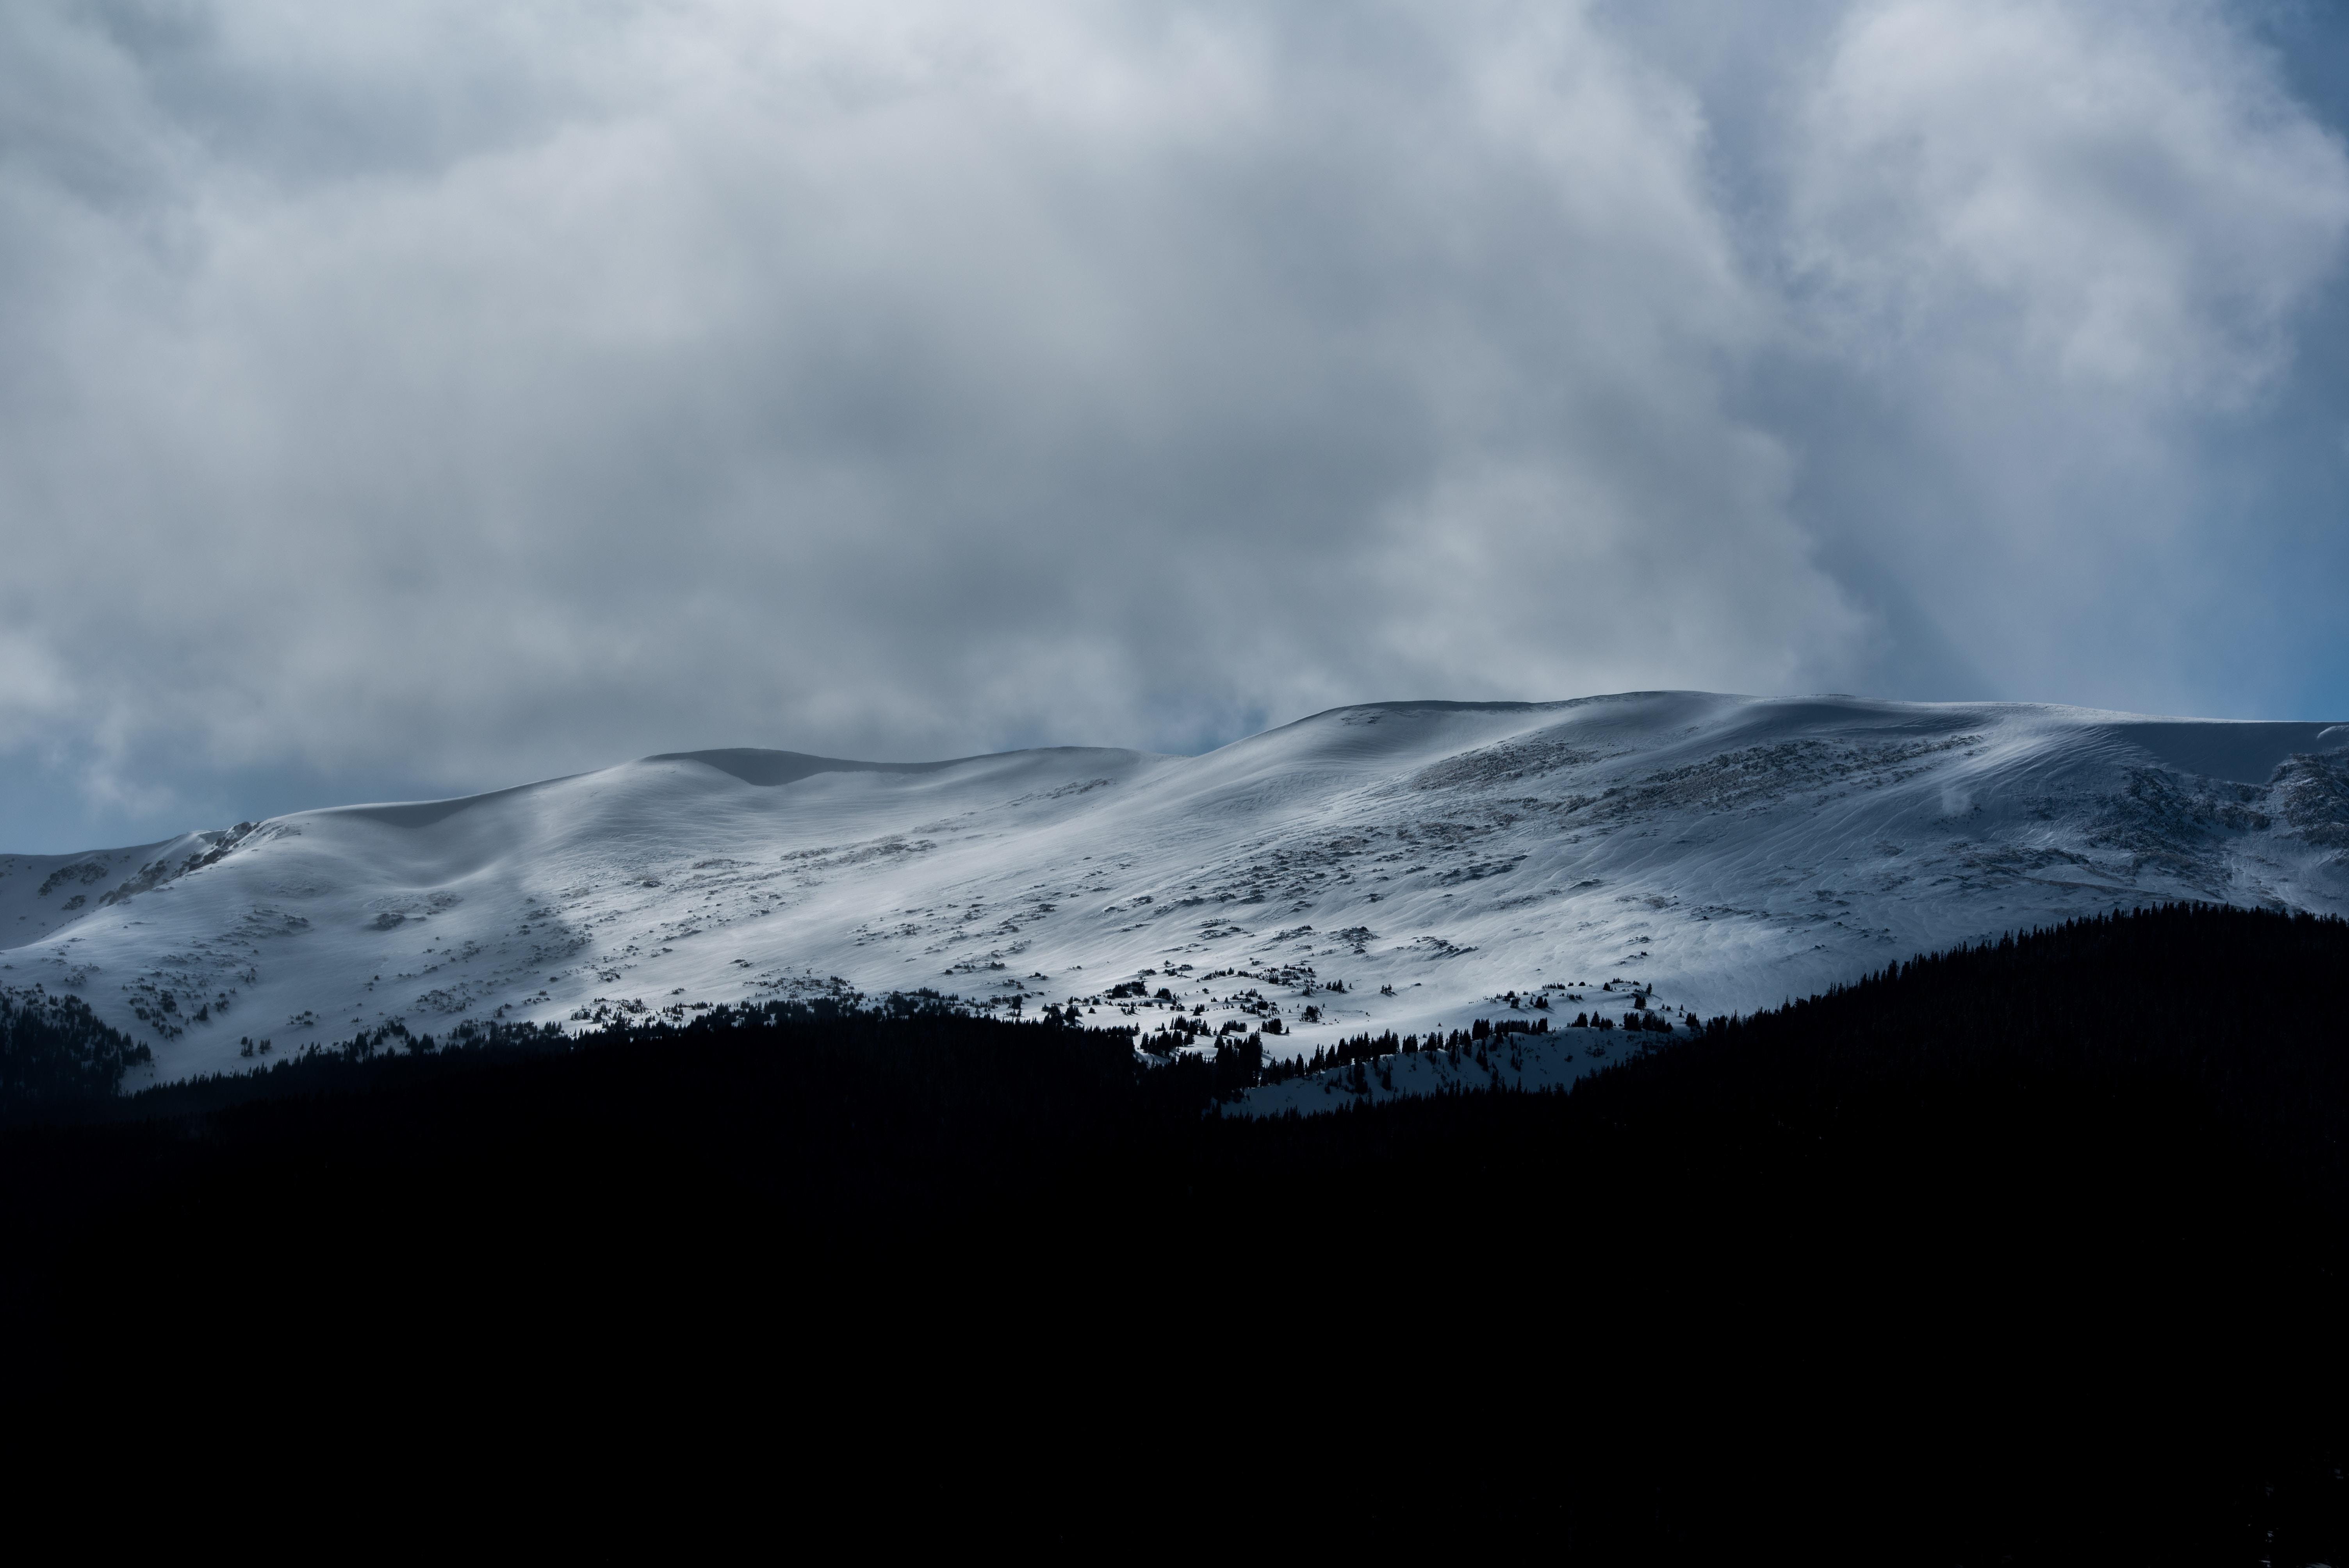 photo of snowy mountain alps